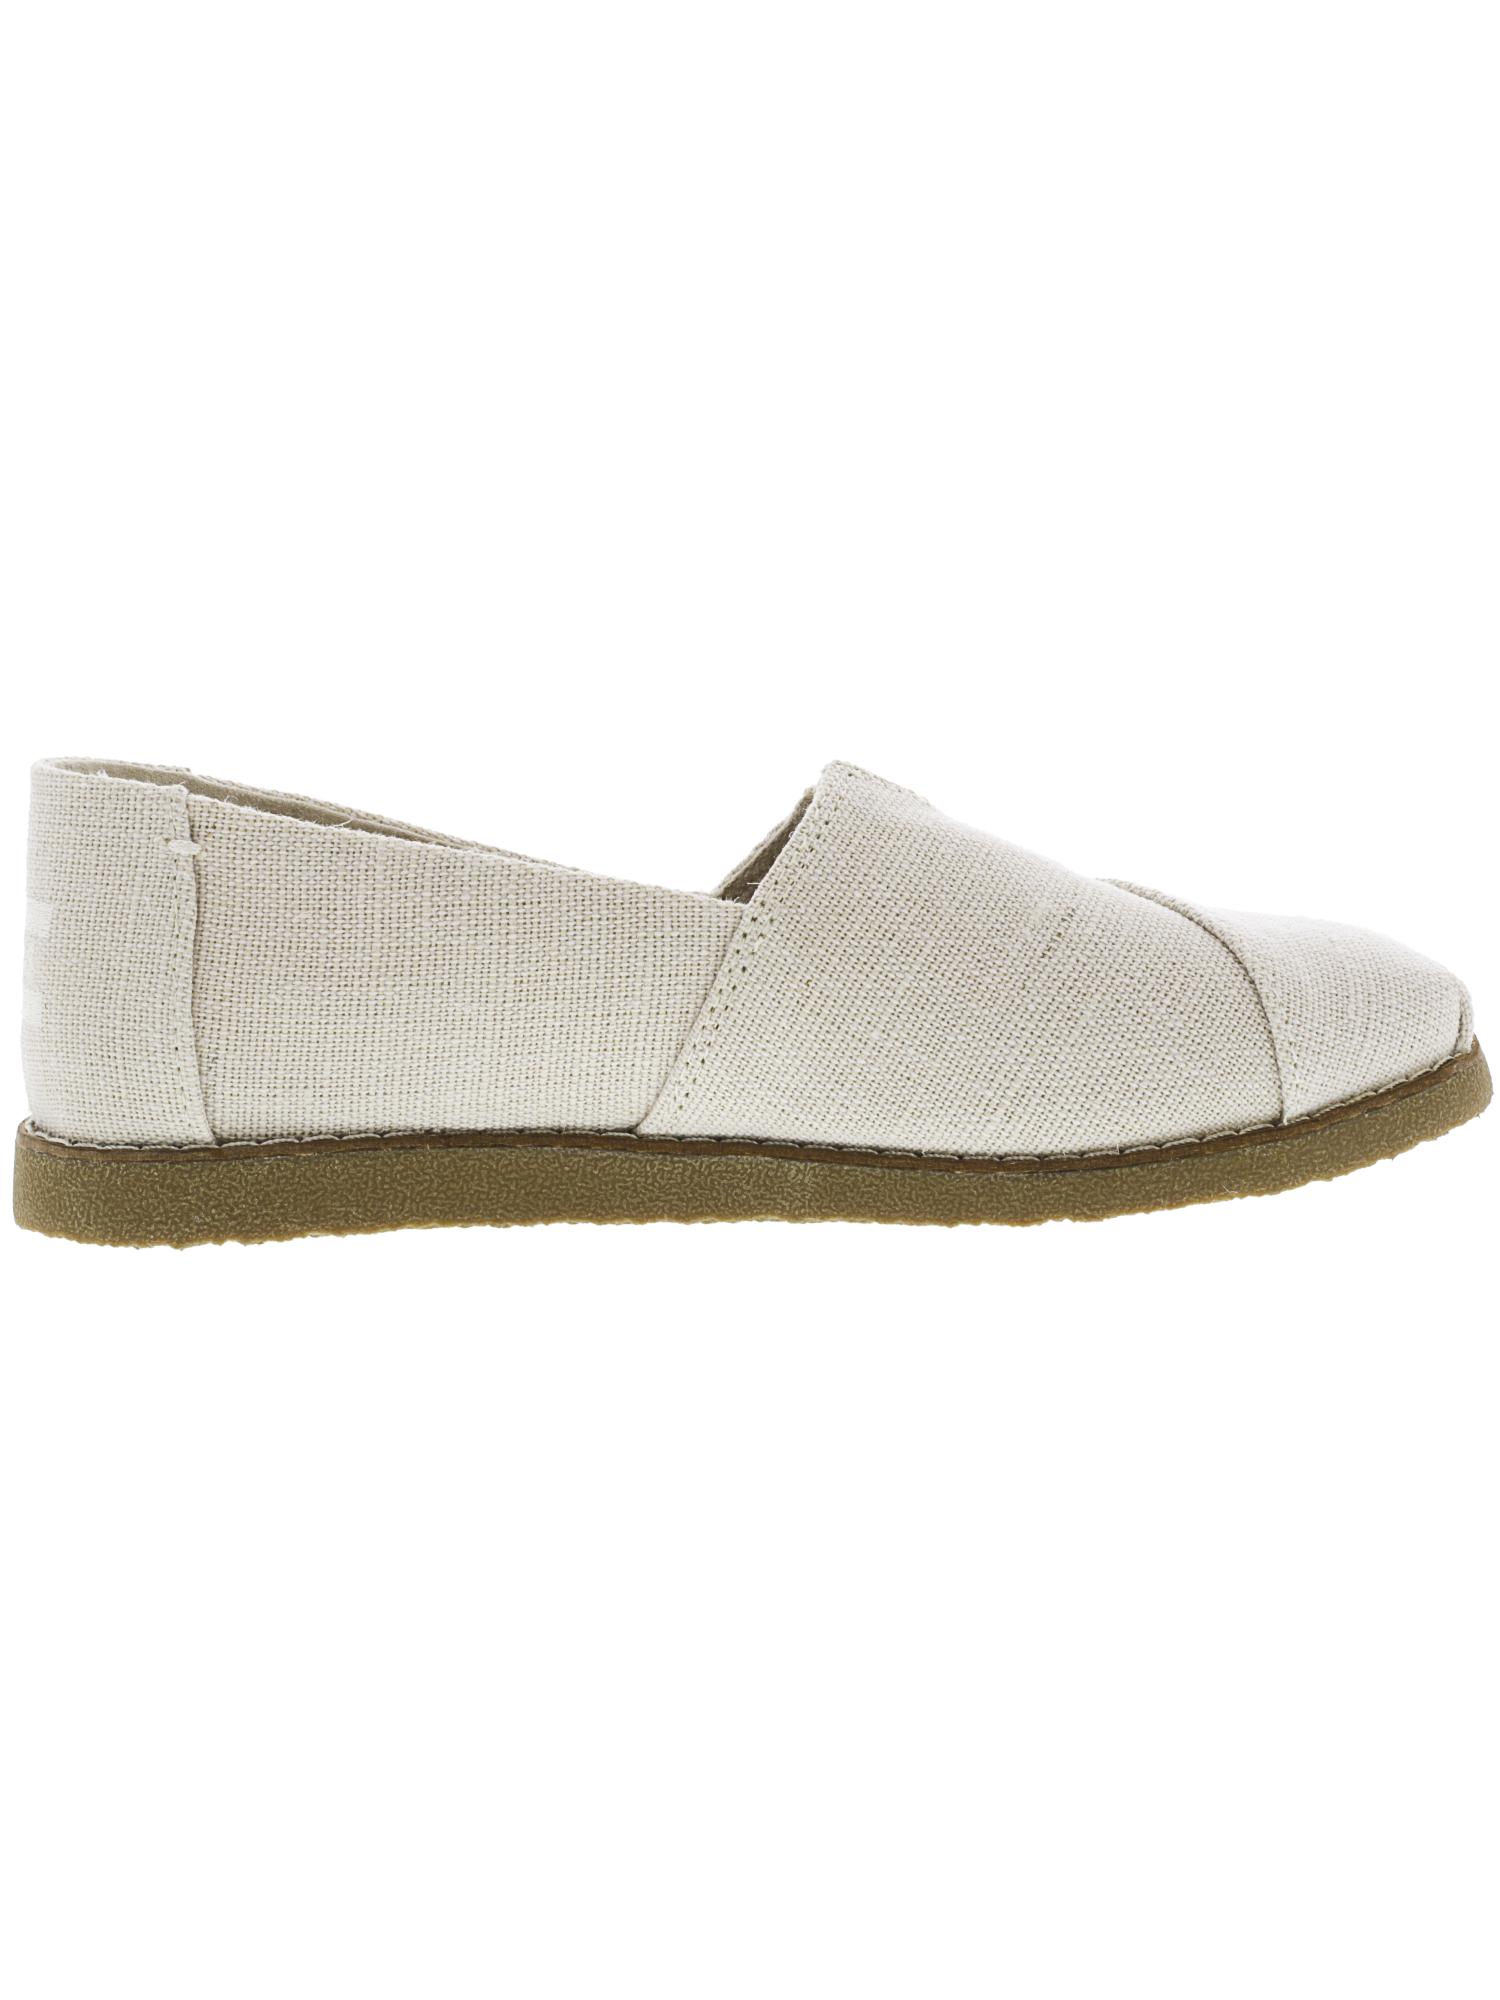 Toms-Women-039-s-Alpargata-Crepe-Heritage-Canvas-Ankle-High-Slip-On-Shoes thumbnail 5